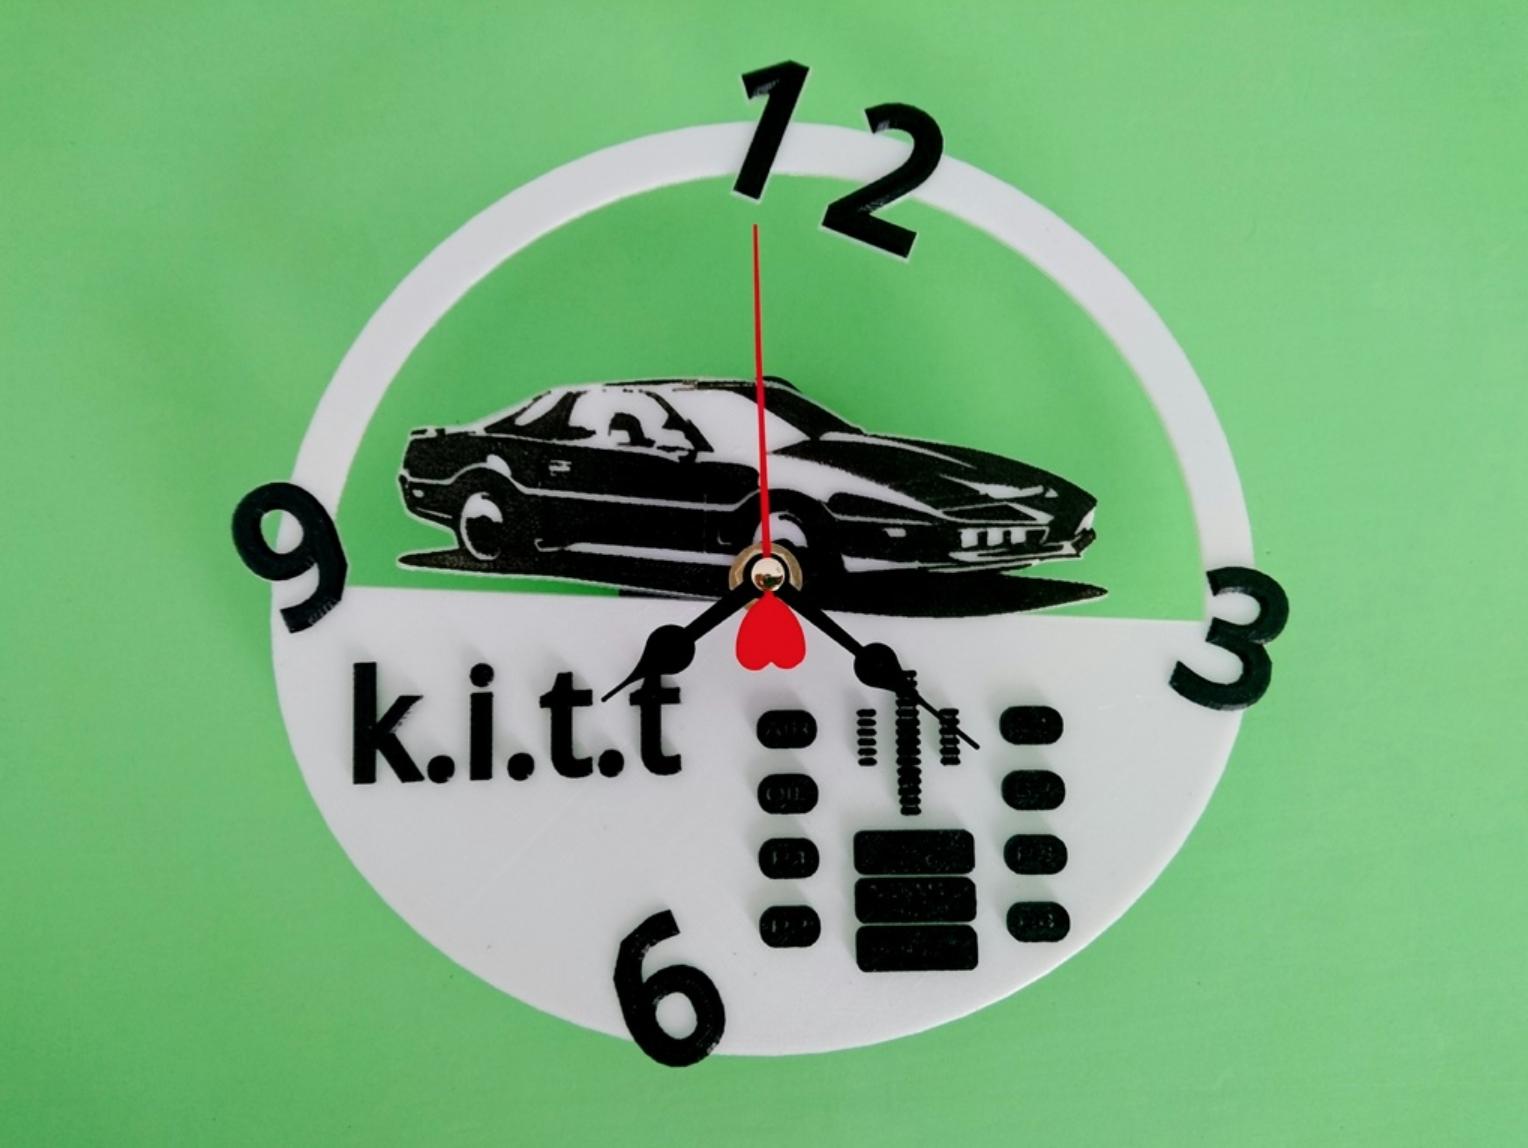 Capture d'écran 2017-10-19 à 14.11.26.png Download free STL file Kitt watch • Object to 3D print, 3dlito